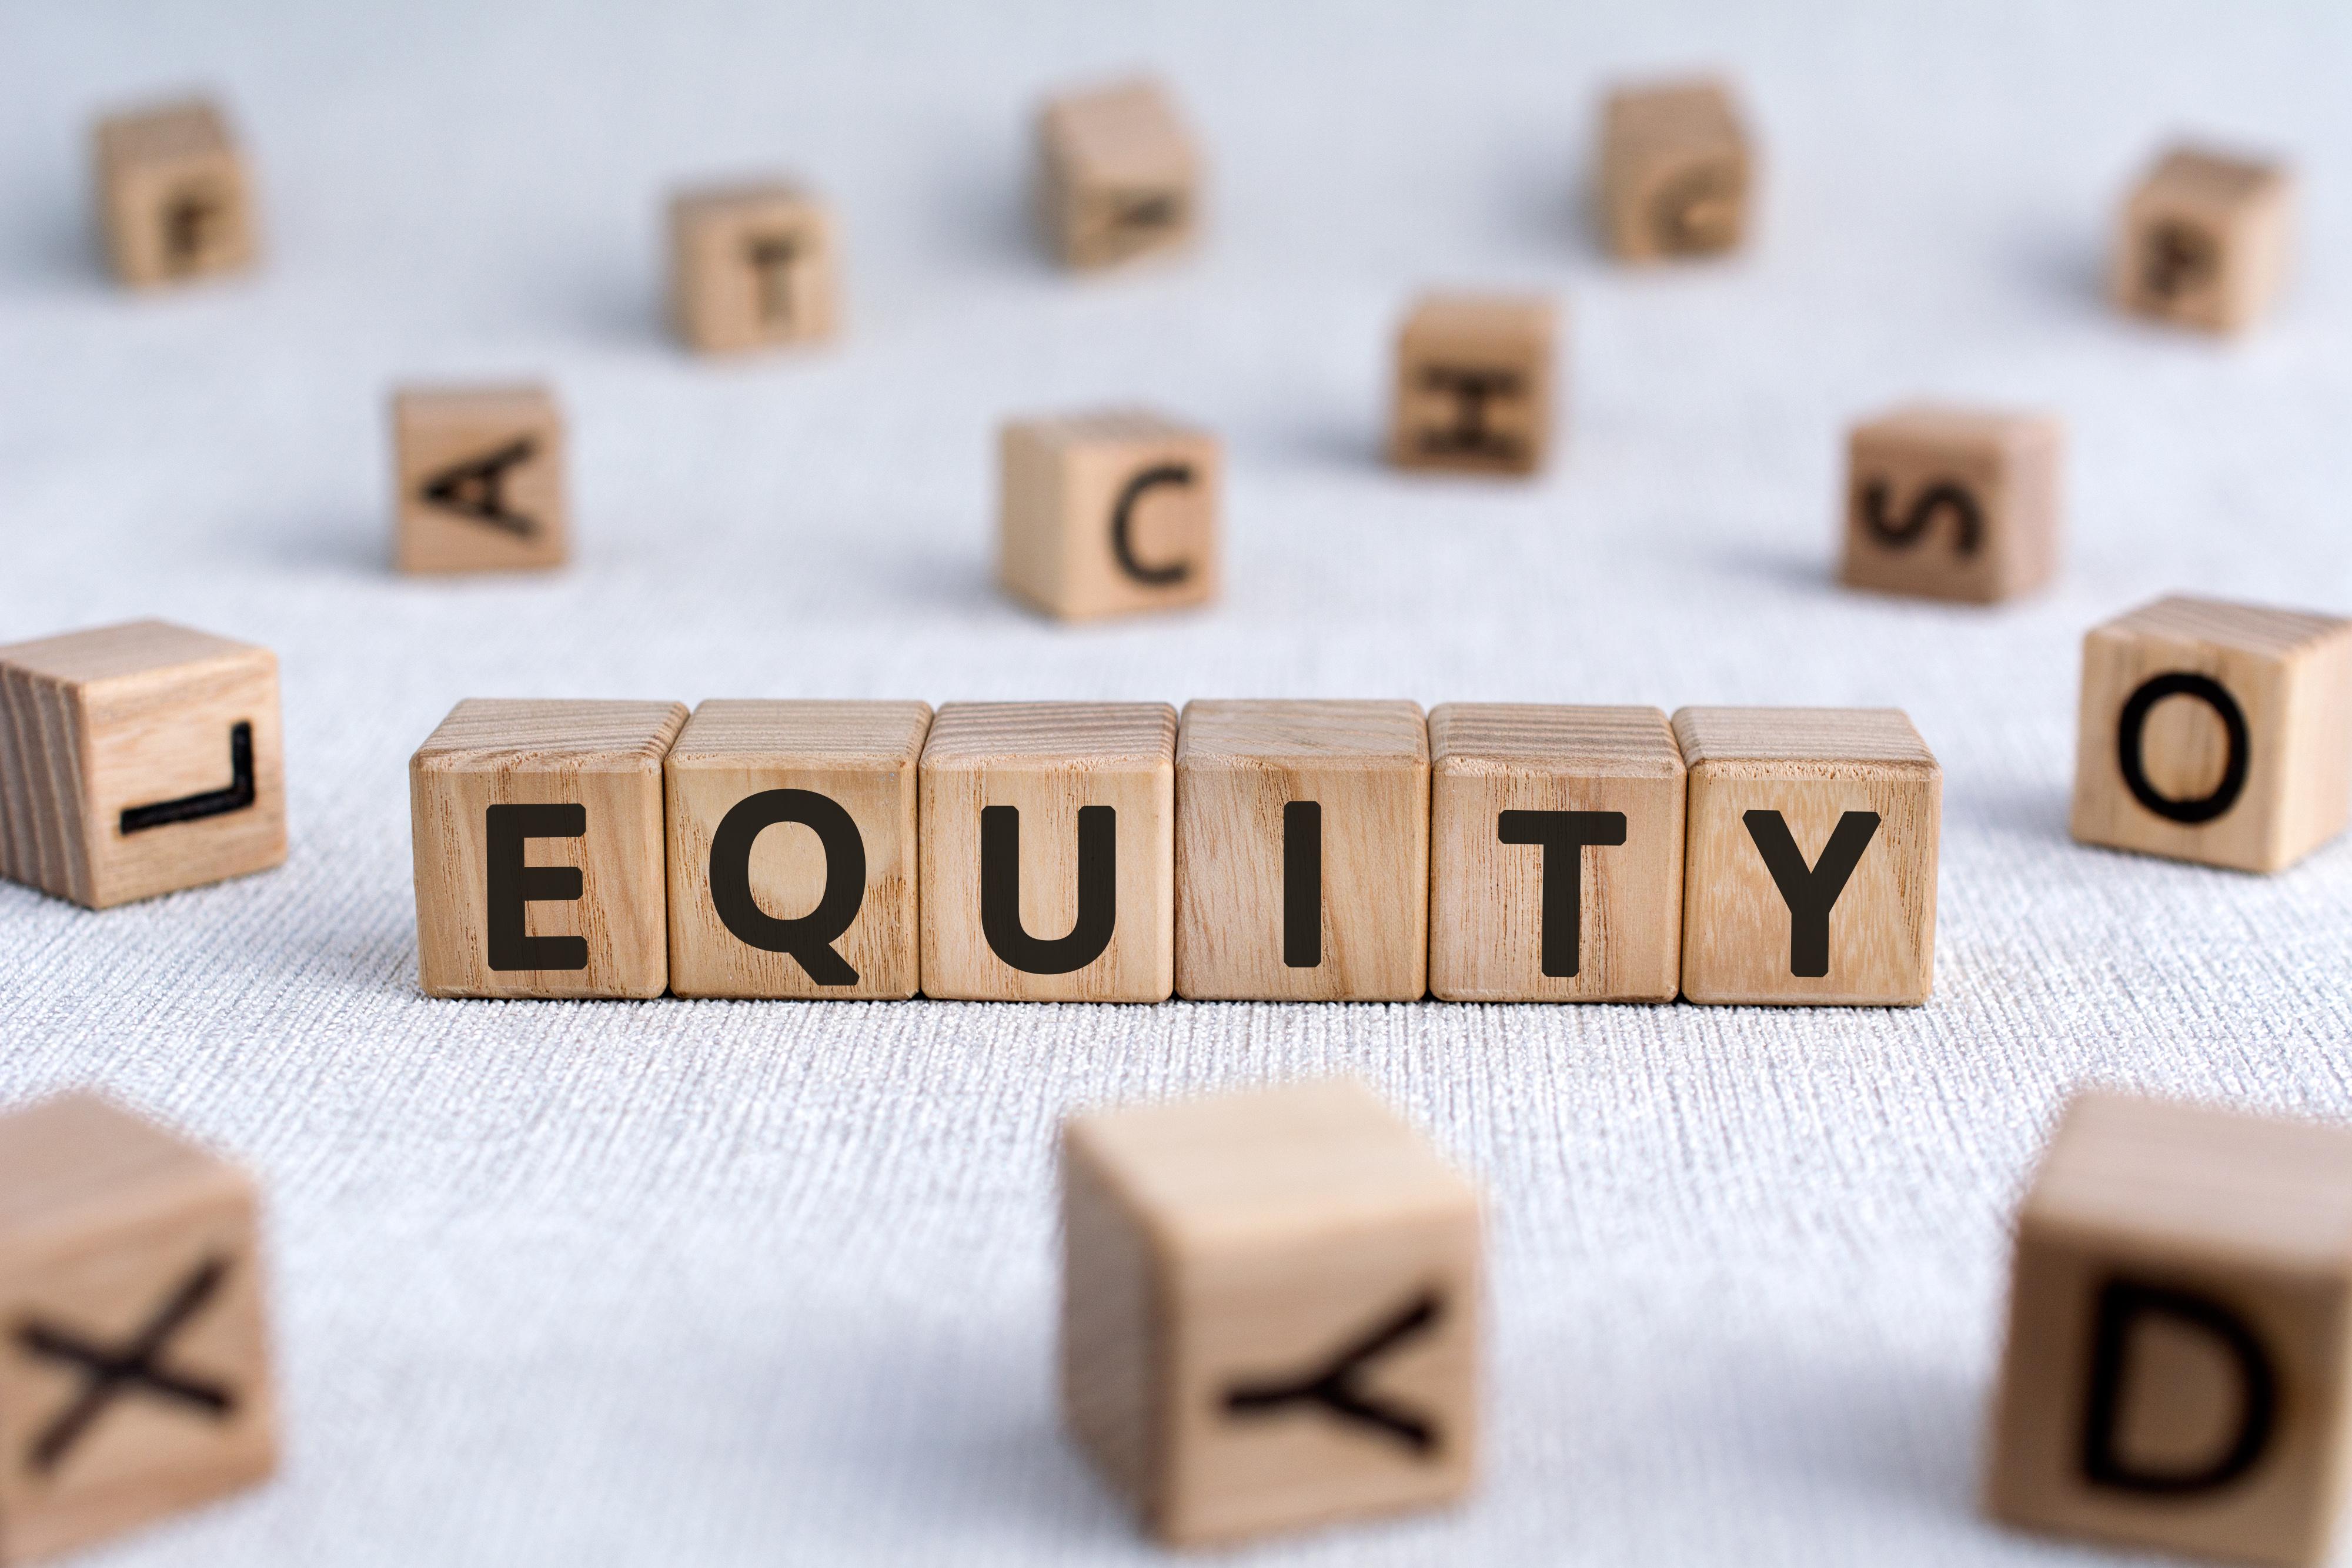 equity in blocks